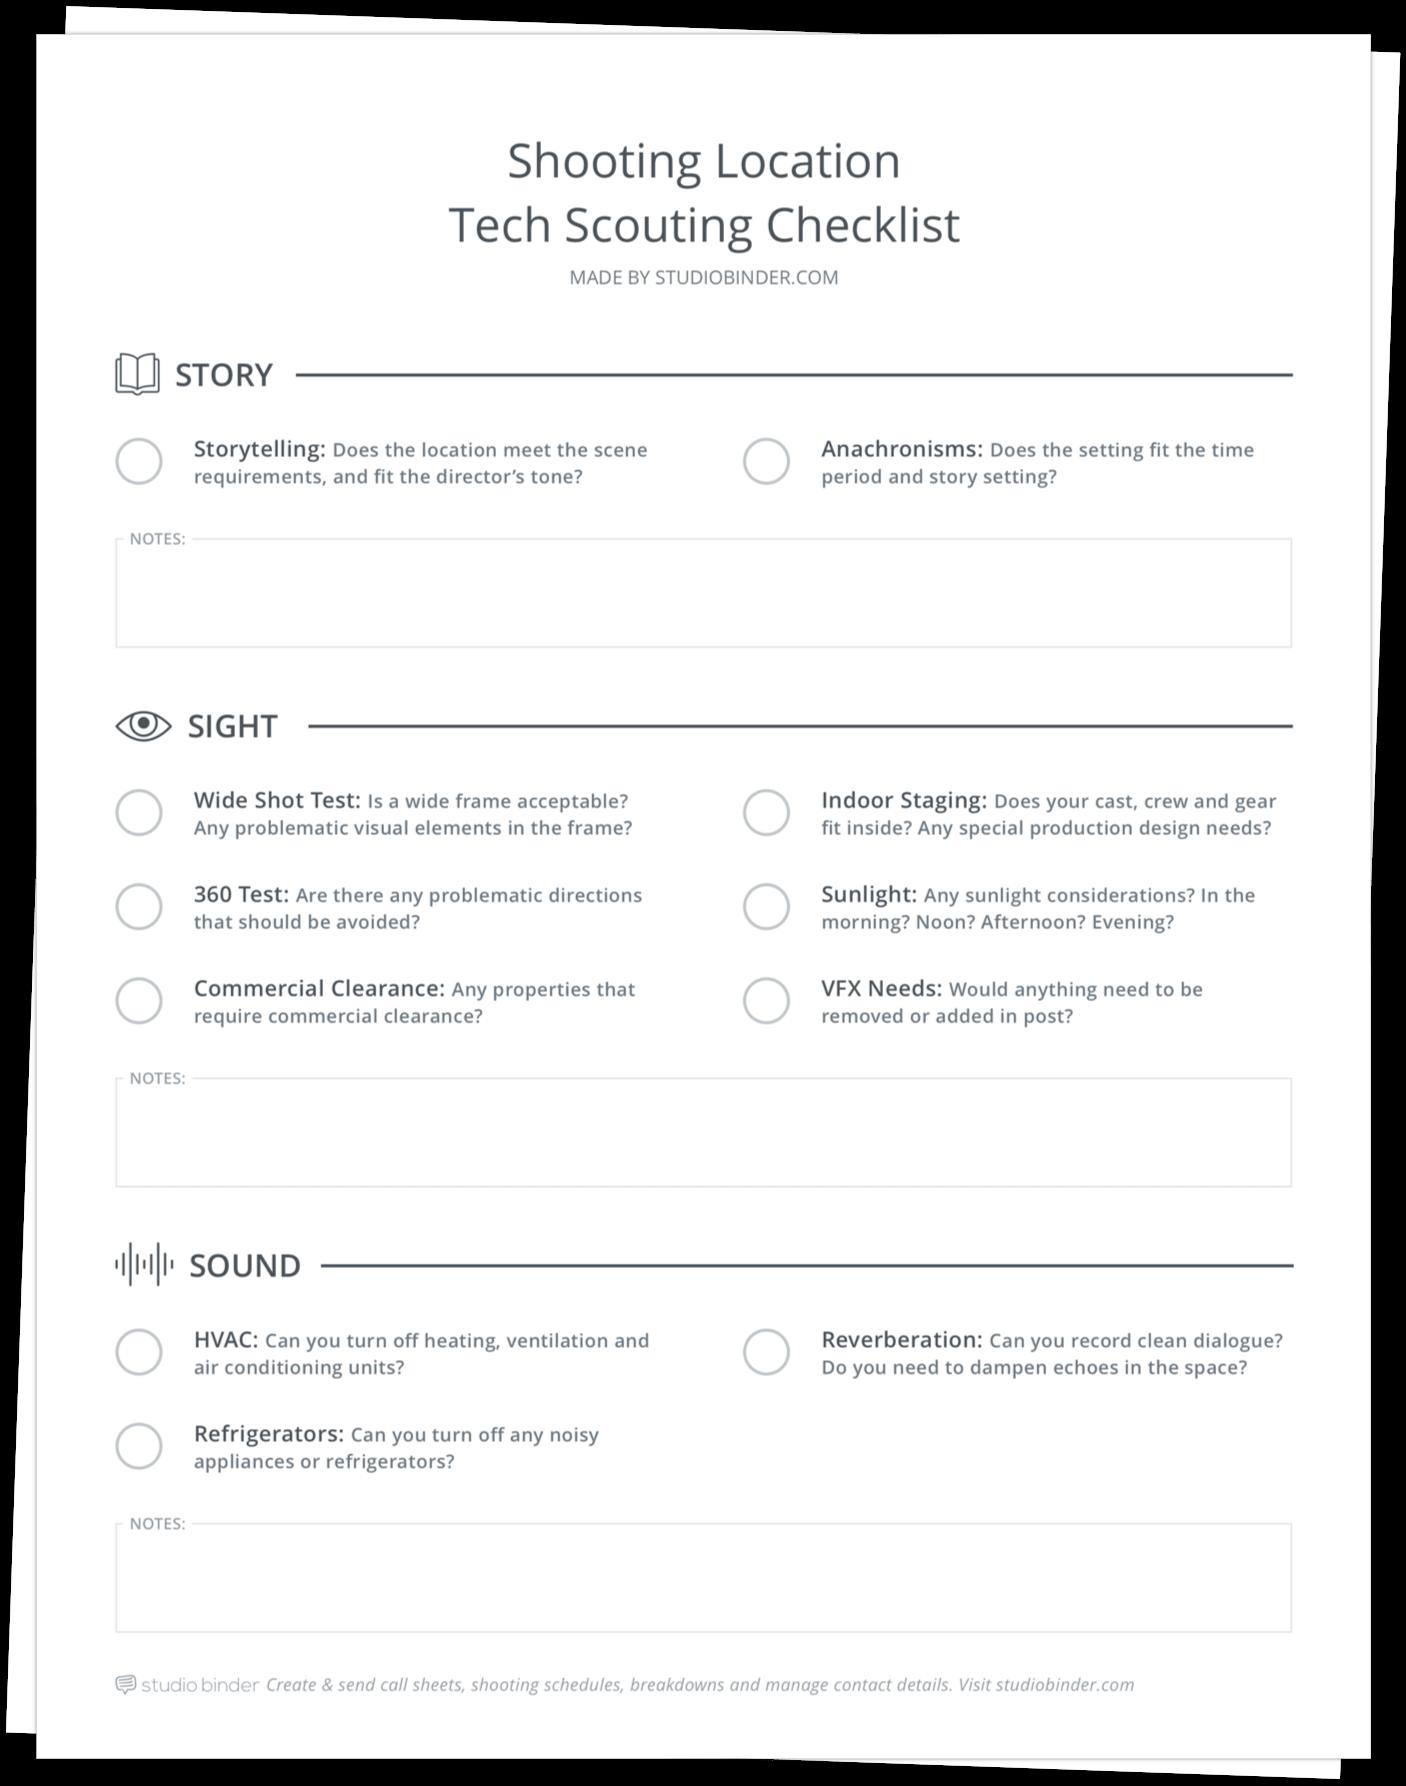 Location Tech Scouting Checklist - Stack - StudioBinder